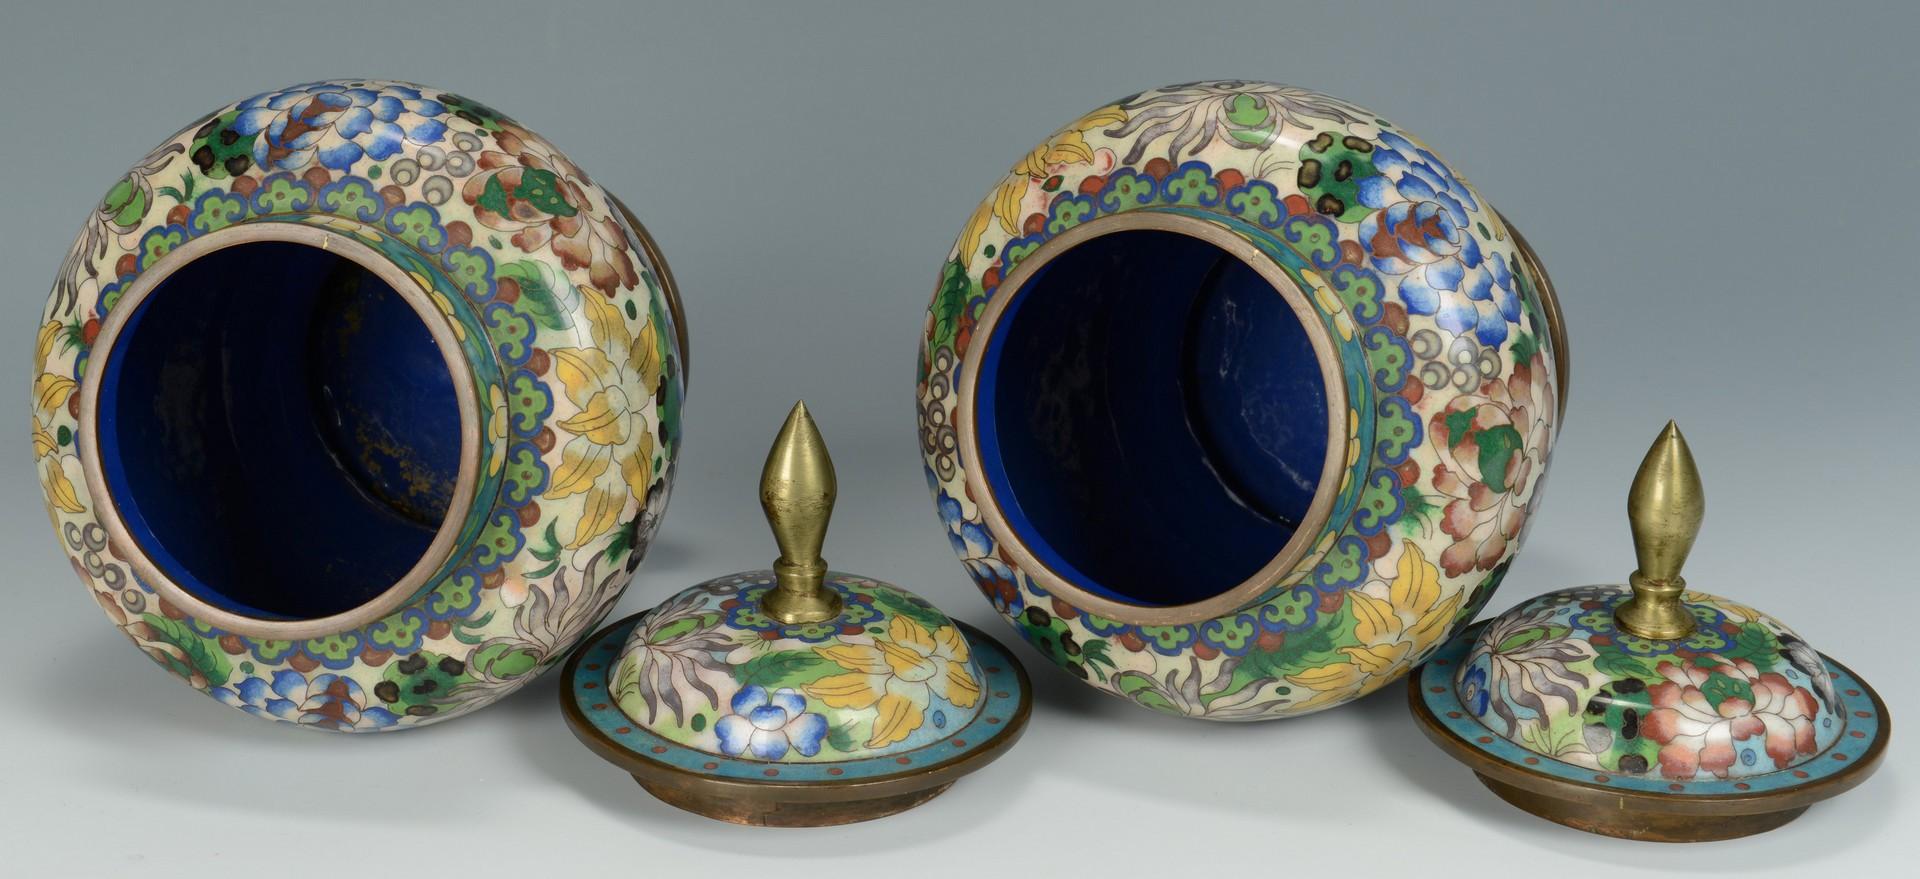 Lot 3383200: Pair of Cloisonne Urns